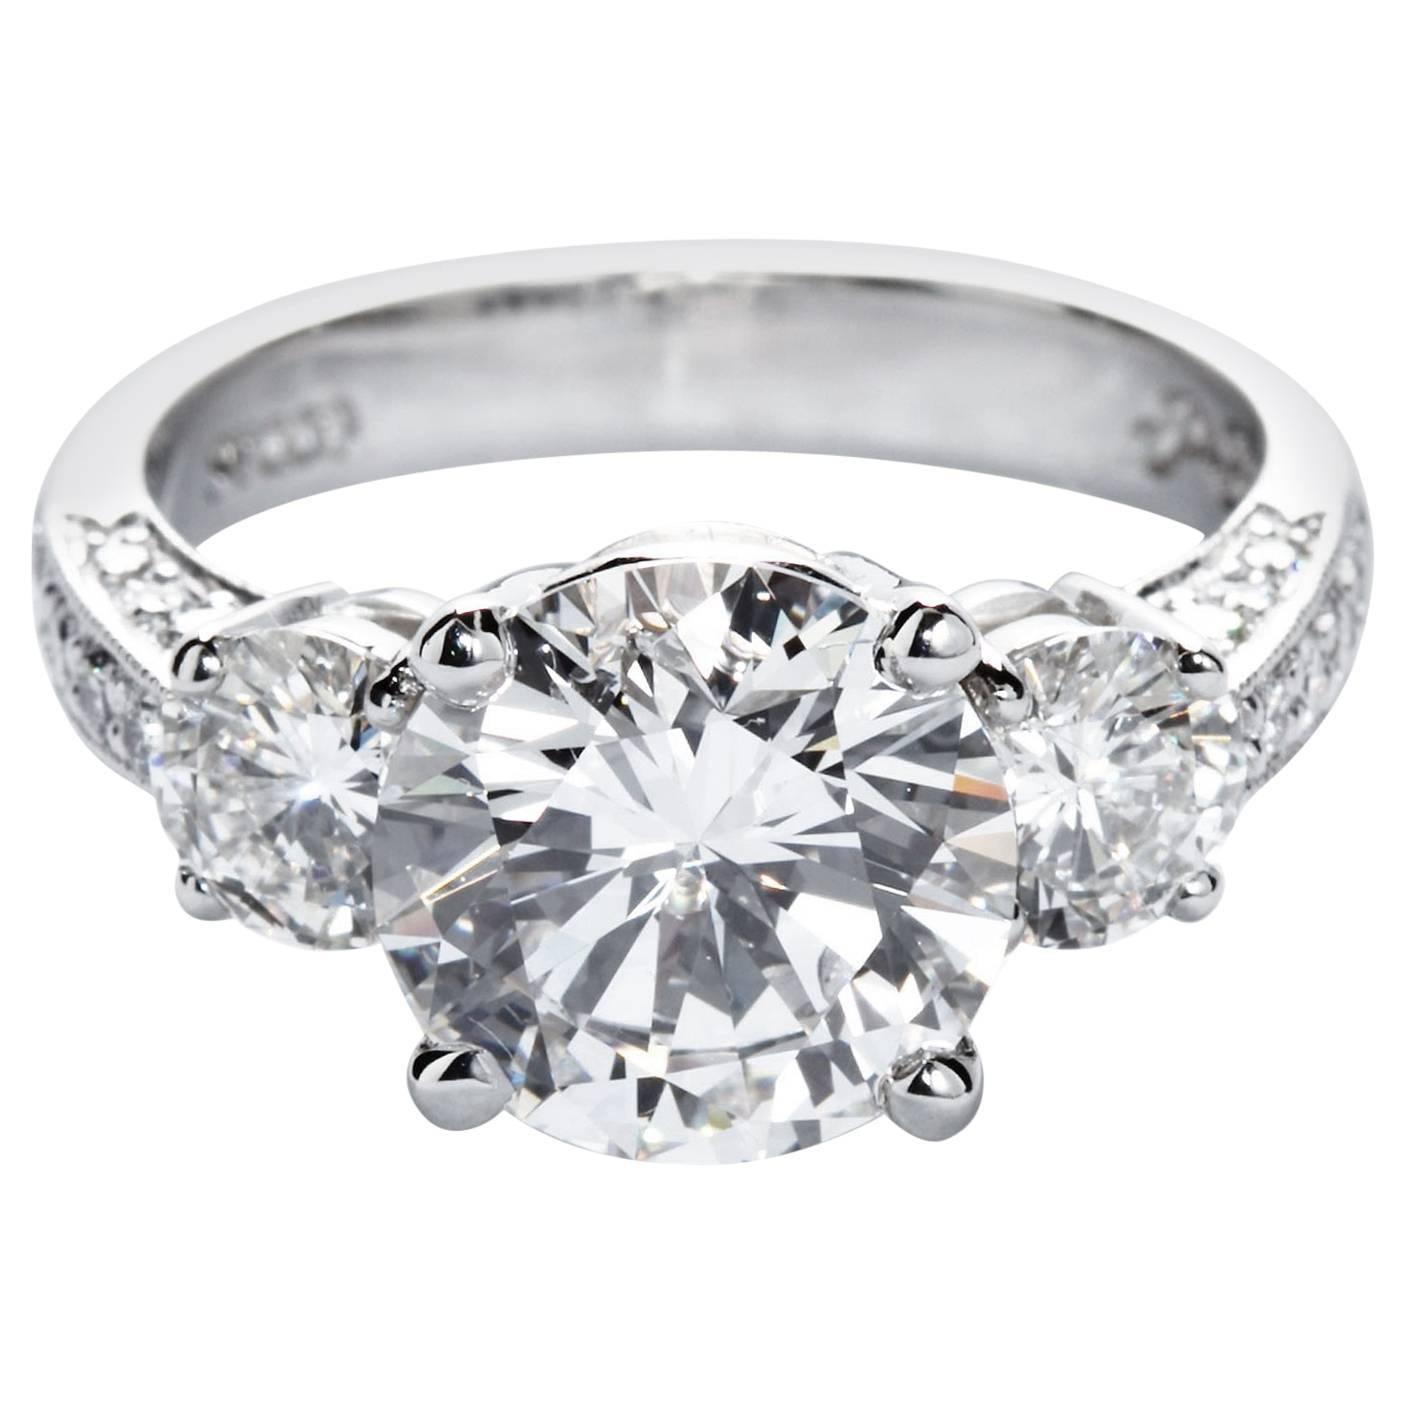 Round Brilliant Diamond Three-Stone Engagement Ring, 3.51 Carat E-VVS2 GIA